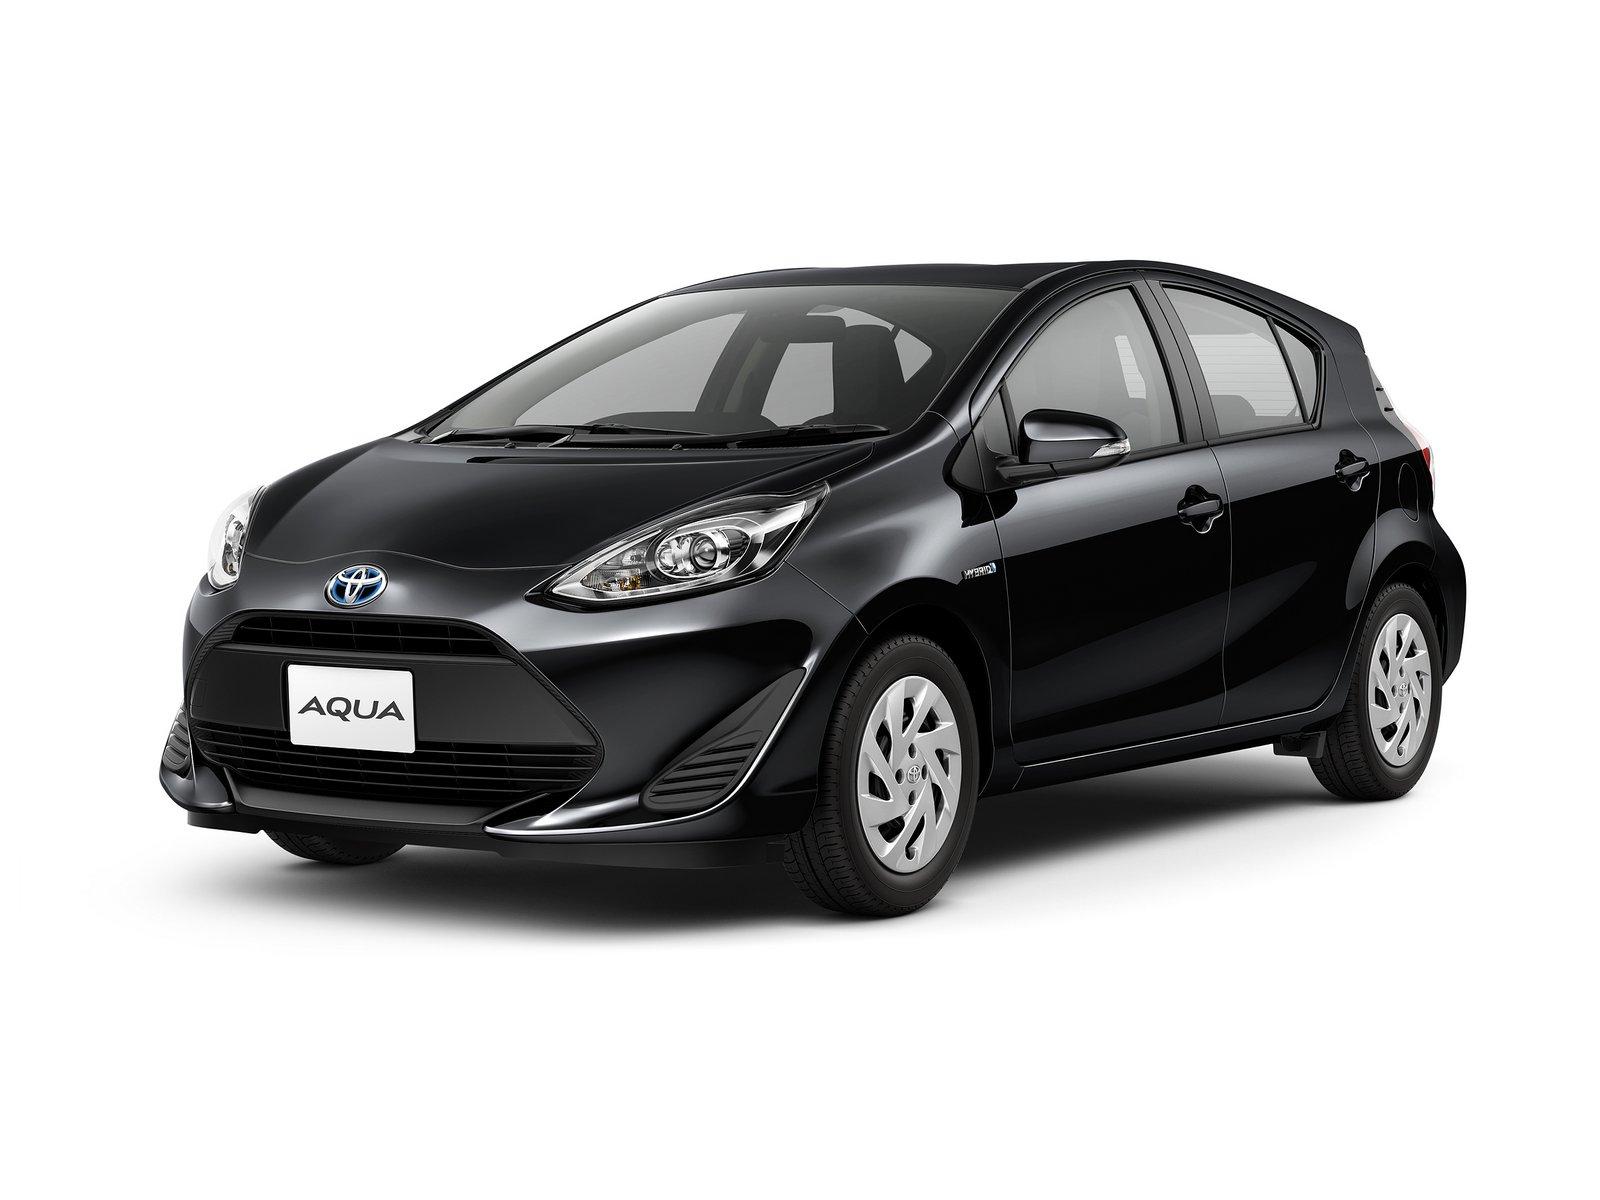 2018_Toyota_Aqua_facelift_18